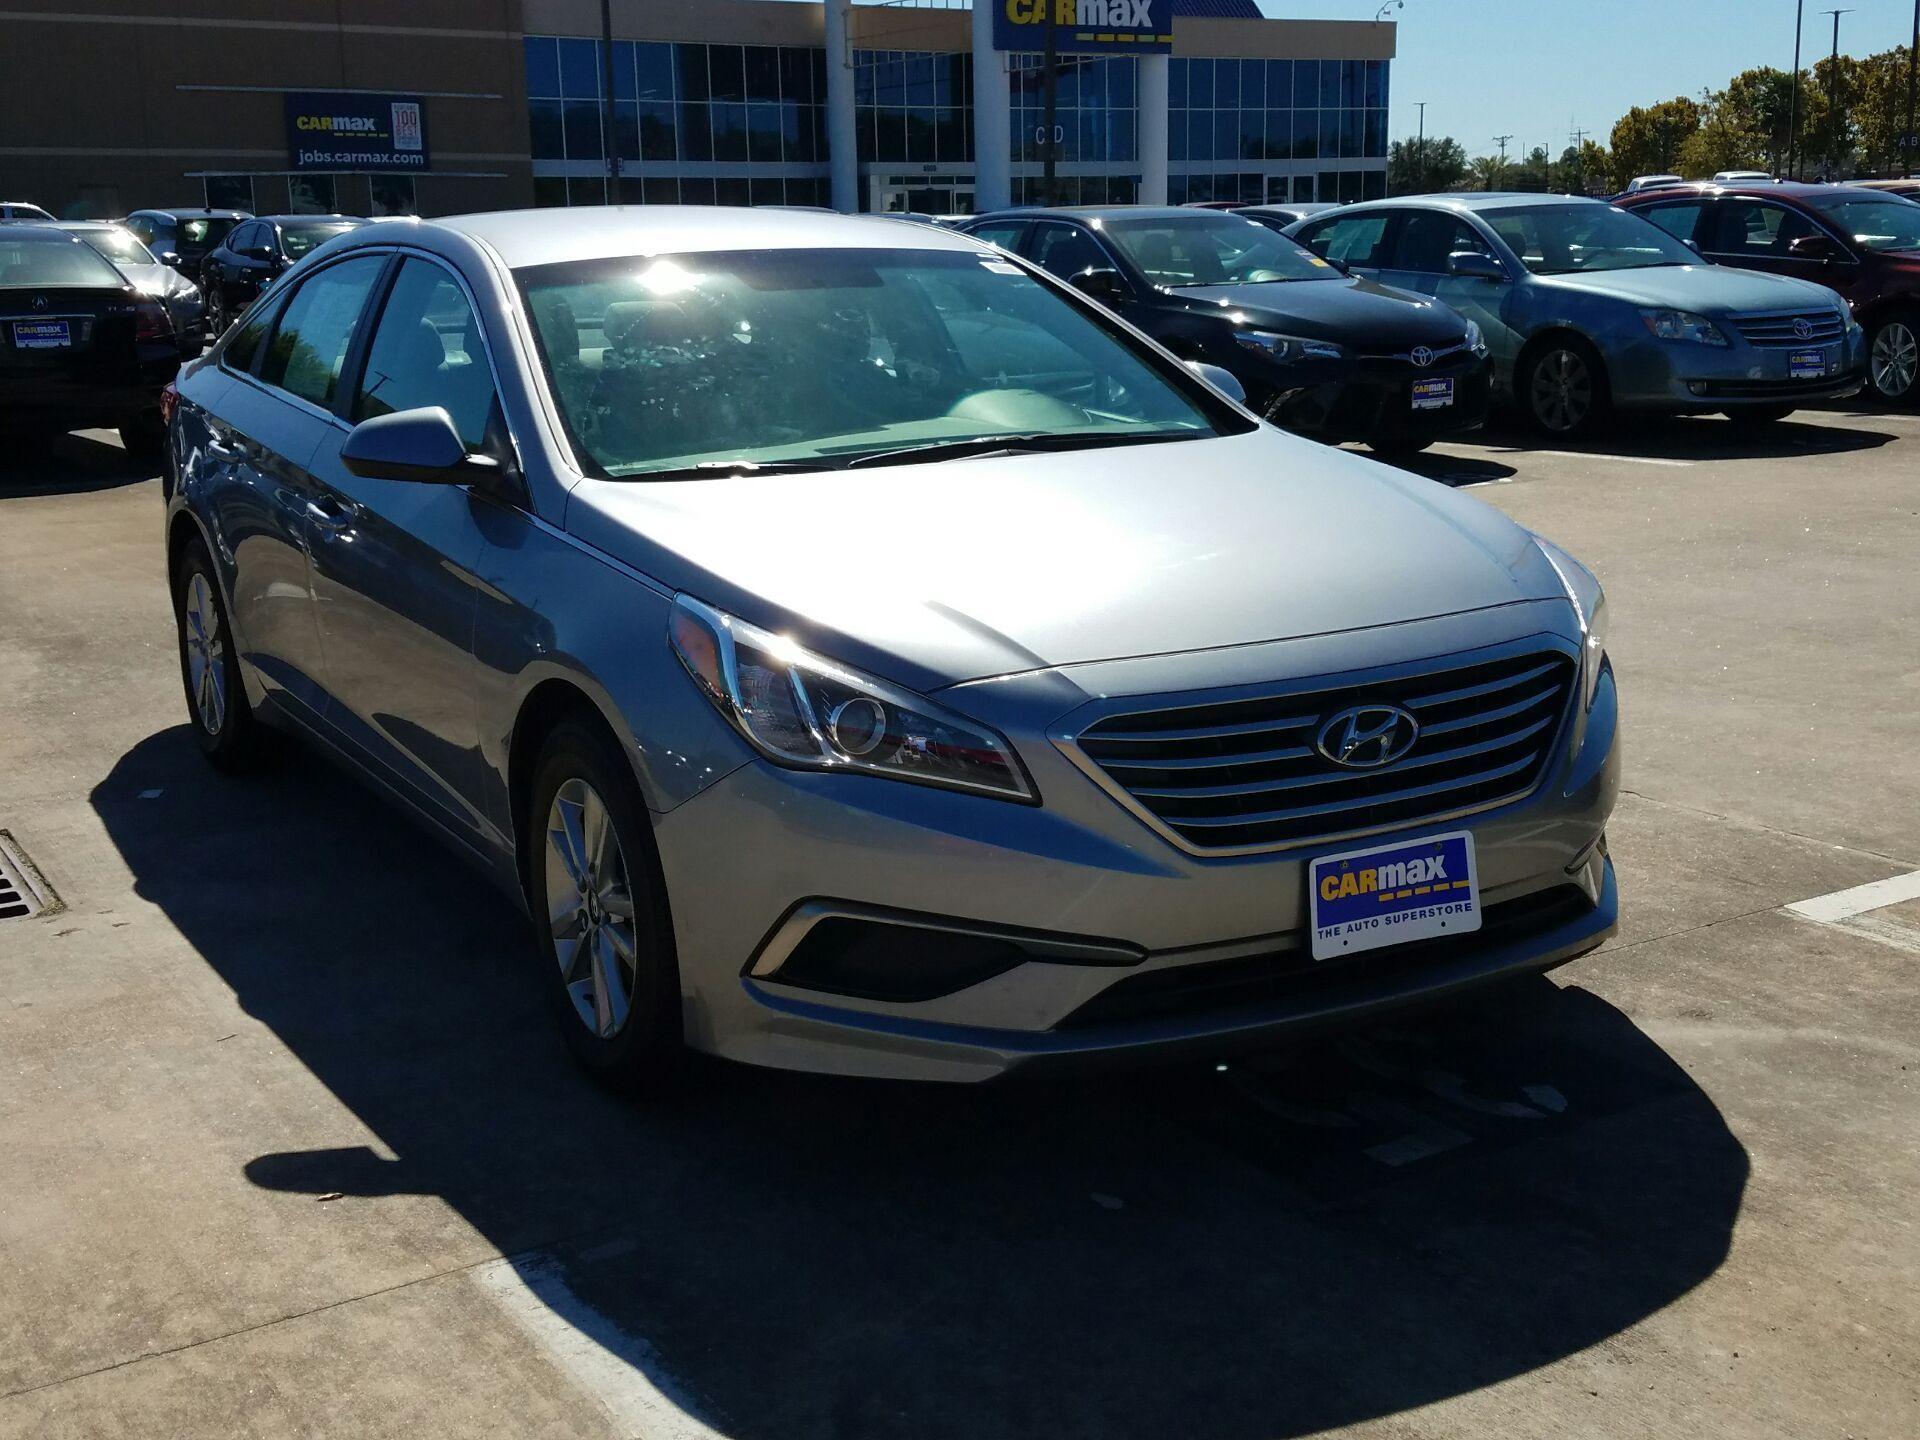 Used 2016 Hyundai Sonata In Houston Texas Carmax